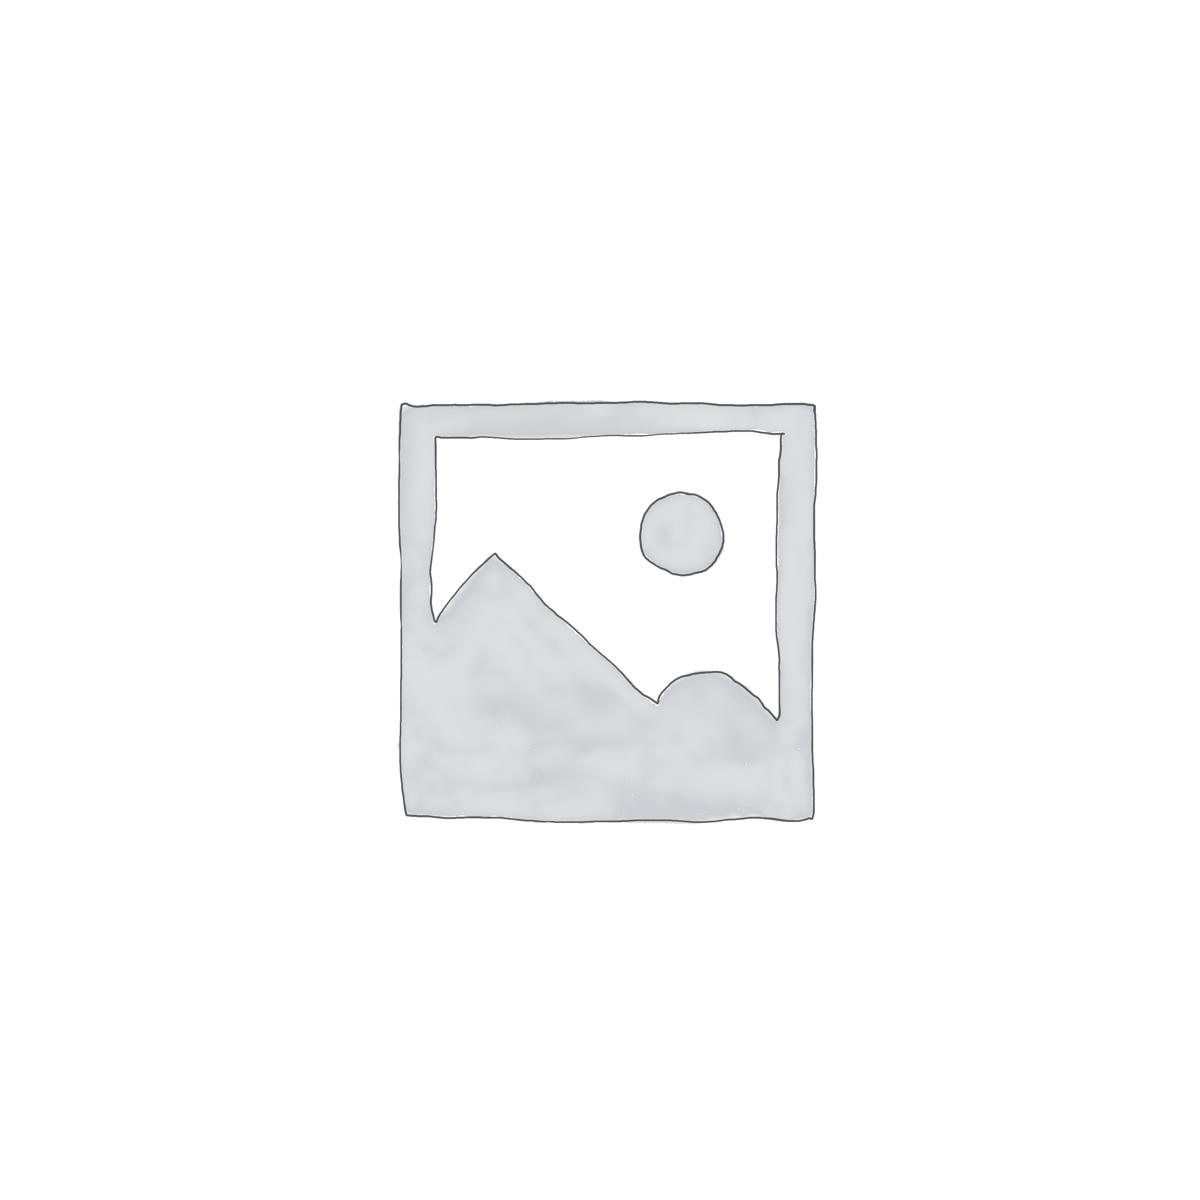 elite99UV-/LED-Nagellack, Gel-Nagellack, für Nail Art, Soak-off-Lack, für Maniküre, 15ml, Farbton Aquamarin (Teal 036)